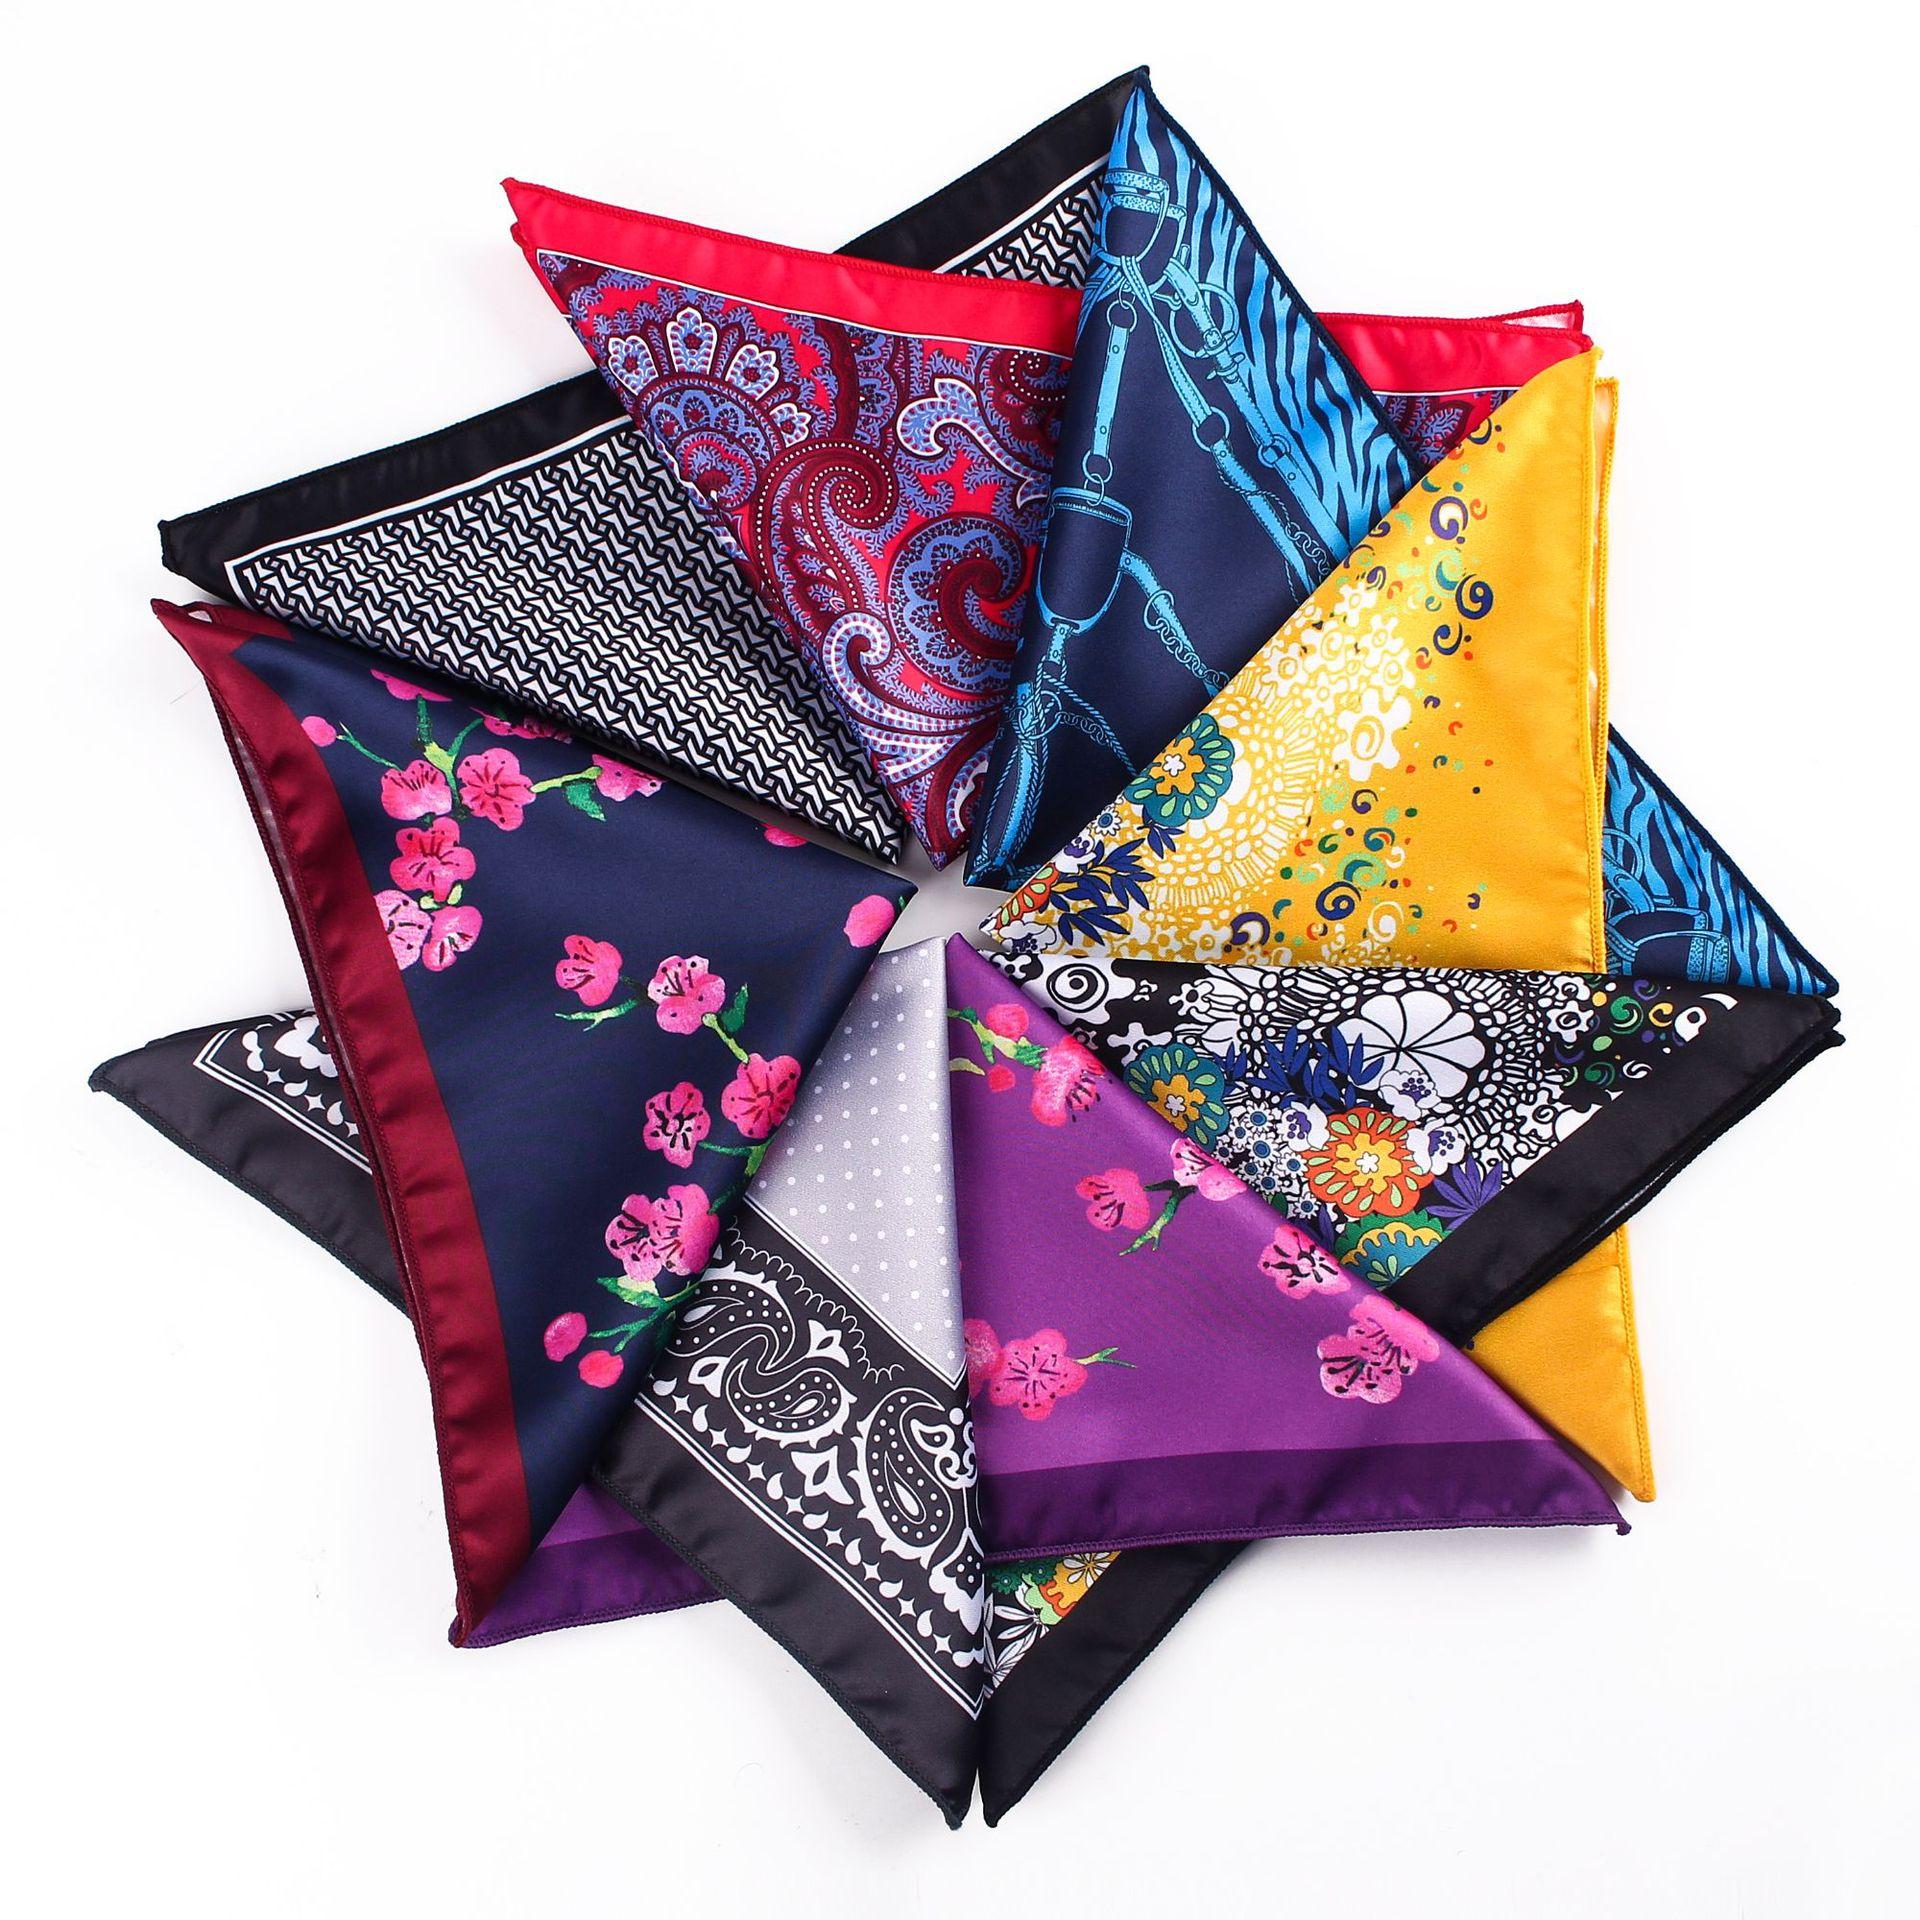 Luxury Mens Handkerchief Silk Accessories Hanky Pocket Squared Handkerchief Pocket Scarf Paisley Polka Dots Party Wedding Prom